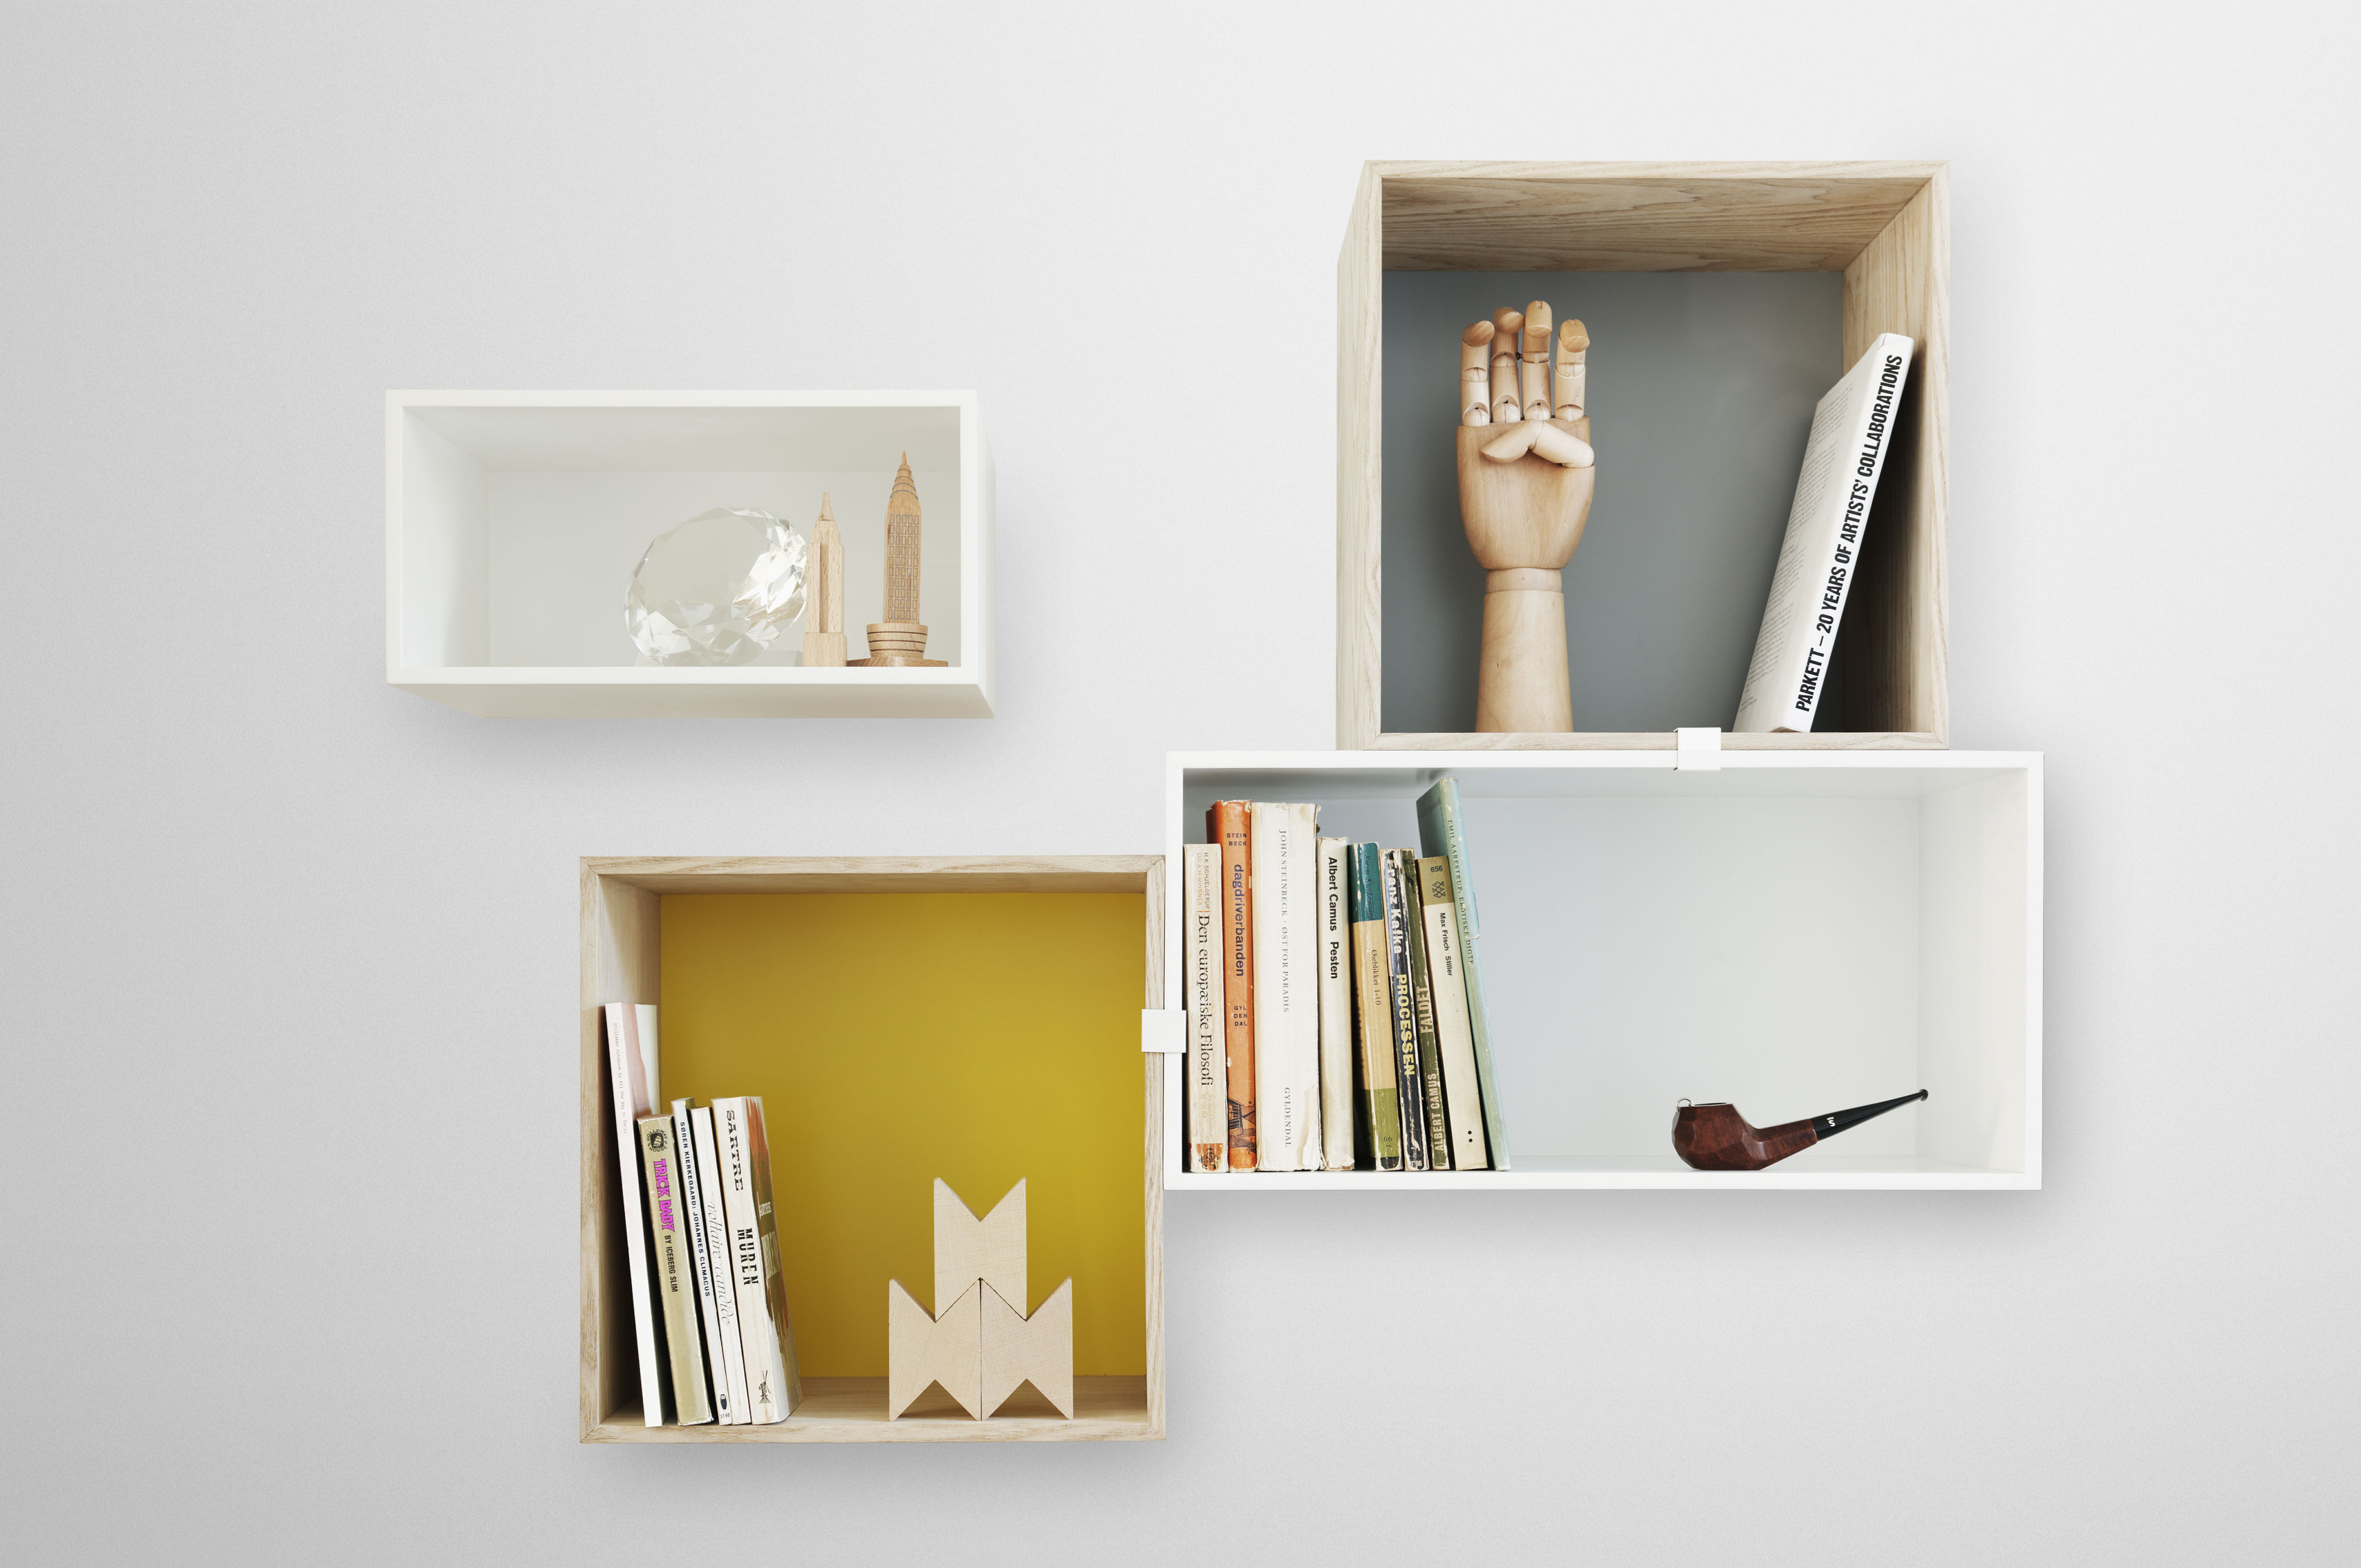 etag re mini stacked large rectangulaire 49x24 cm avec fond fr ne muuto. Black Bedroom Furniture Sets. Home Design Ideas